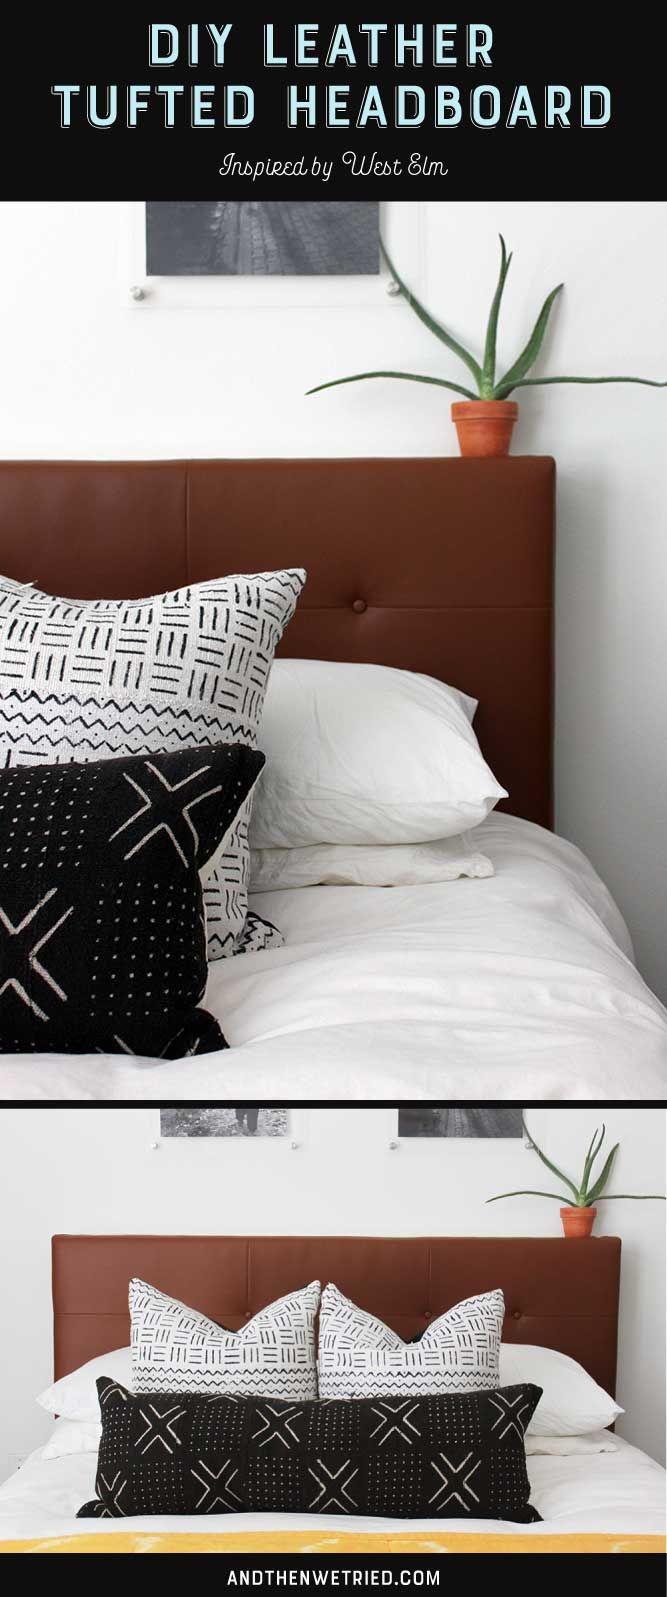 West Elm Inspired DIY Leather Tufted Headboard | Diy ...